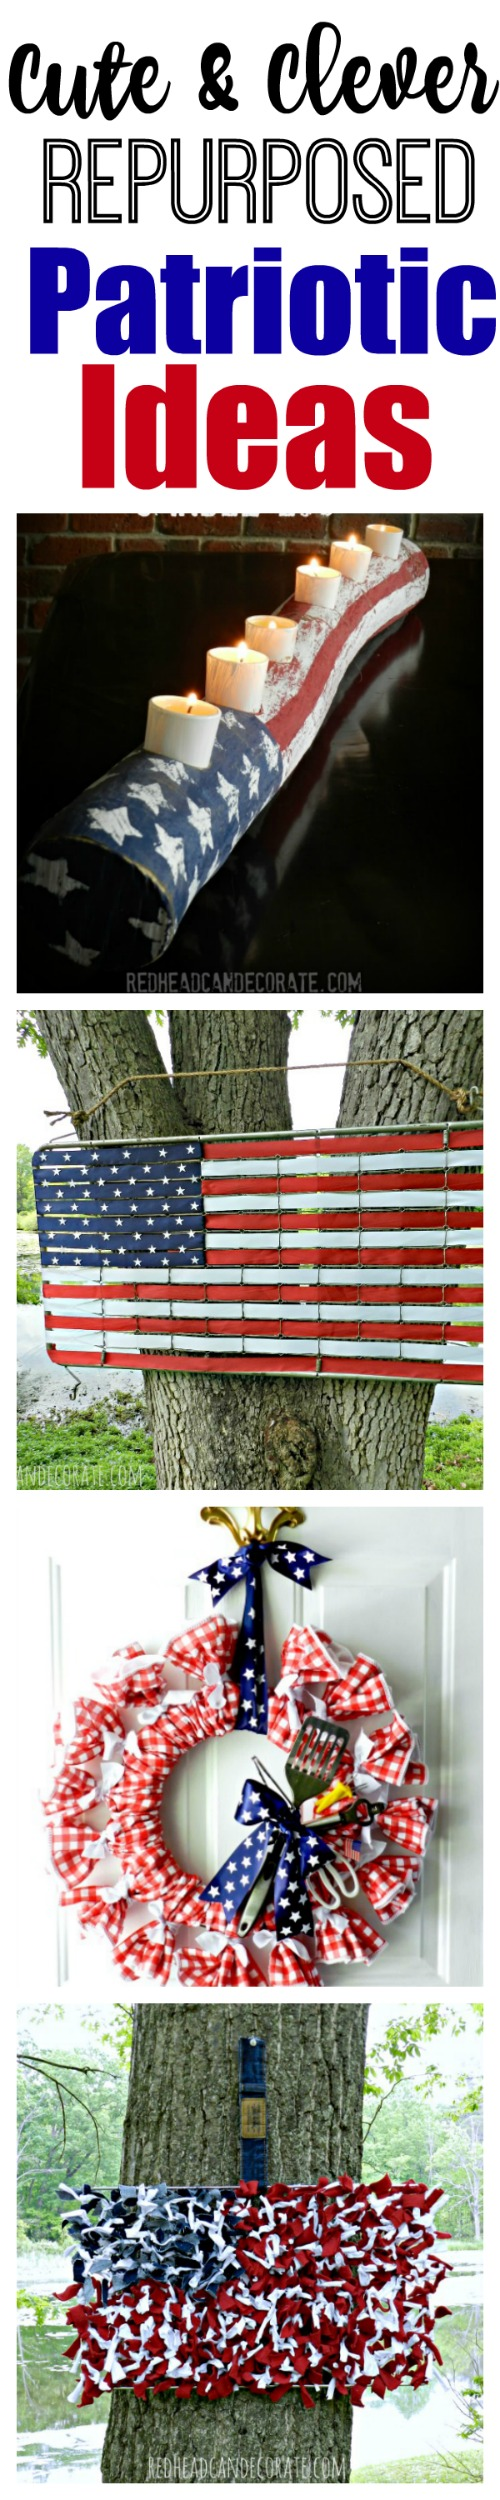 These repurposed patriotic ideas are so creative and fun!